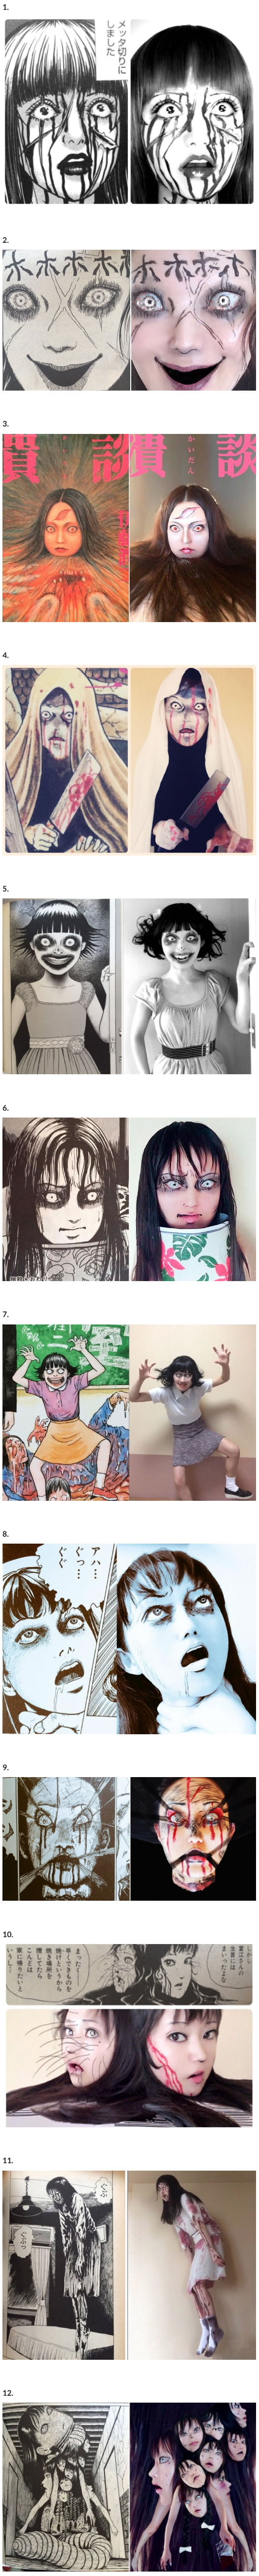 Japanese Cosplayer Brings Junji Ito's Manga into Terrifying Reality (By Ikura)